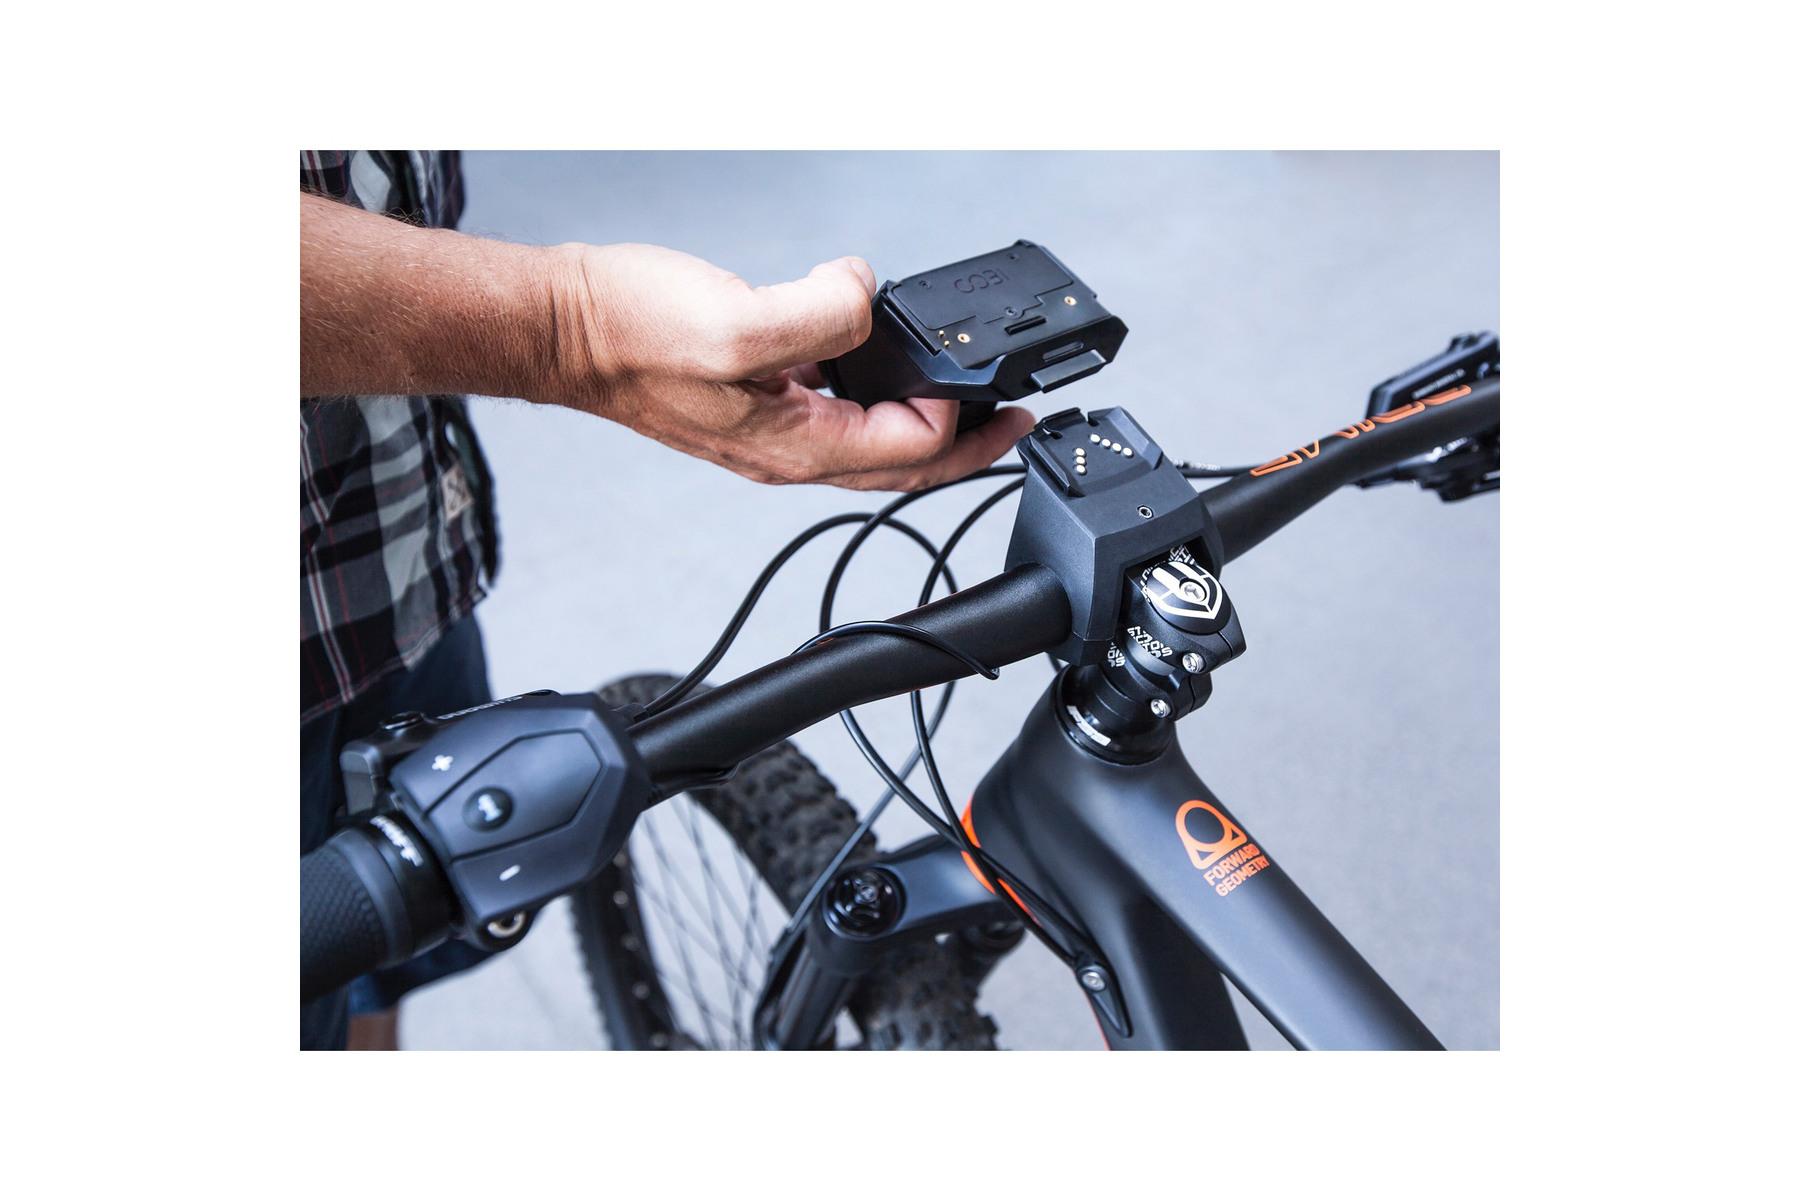 cobi sport smart fietssysteem voor bosch e bike 2e. Black Bedroom Furniture Sets. Home Design Ideas